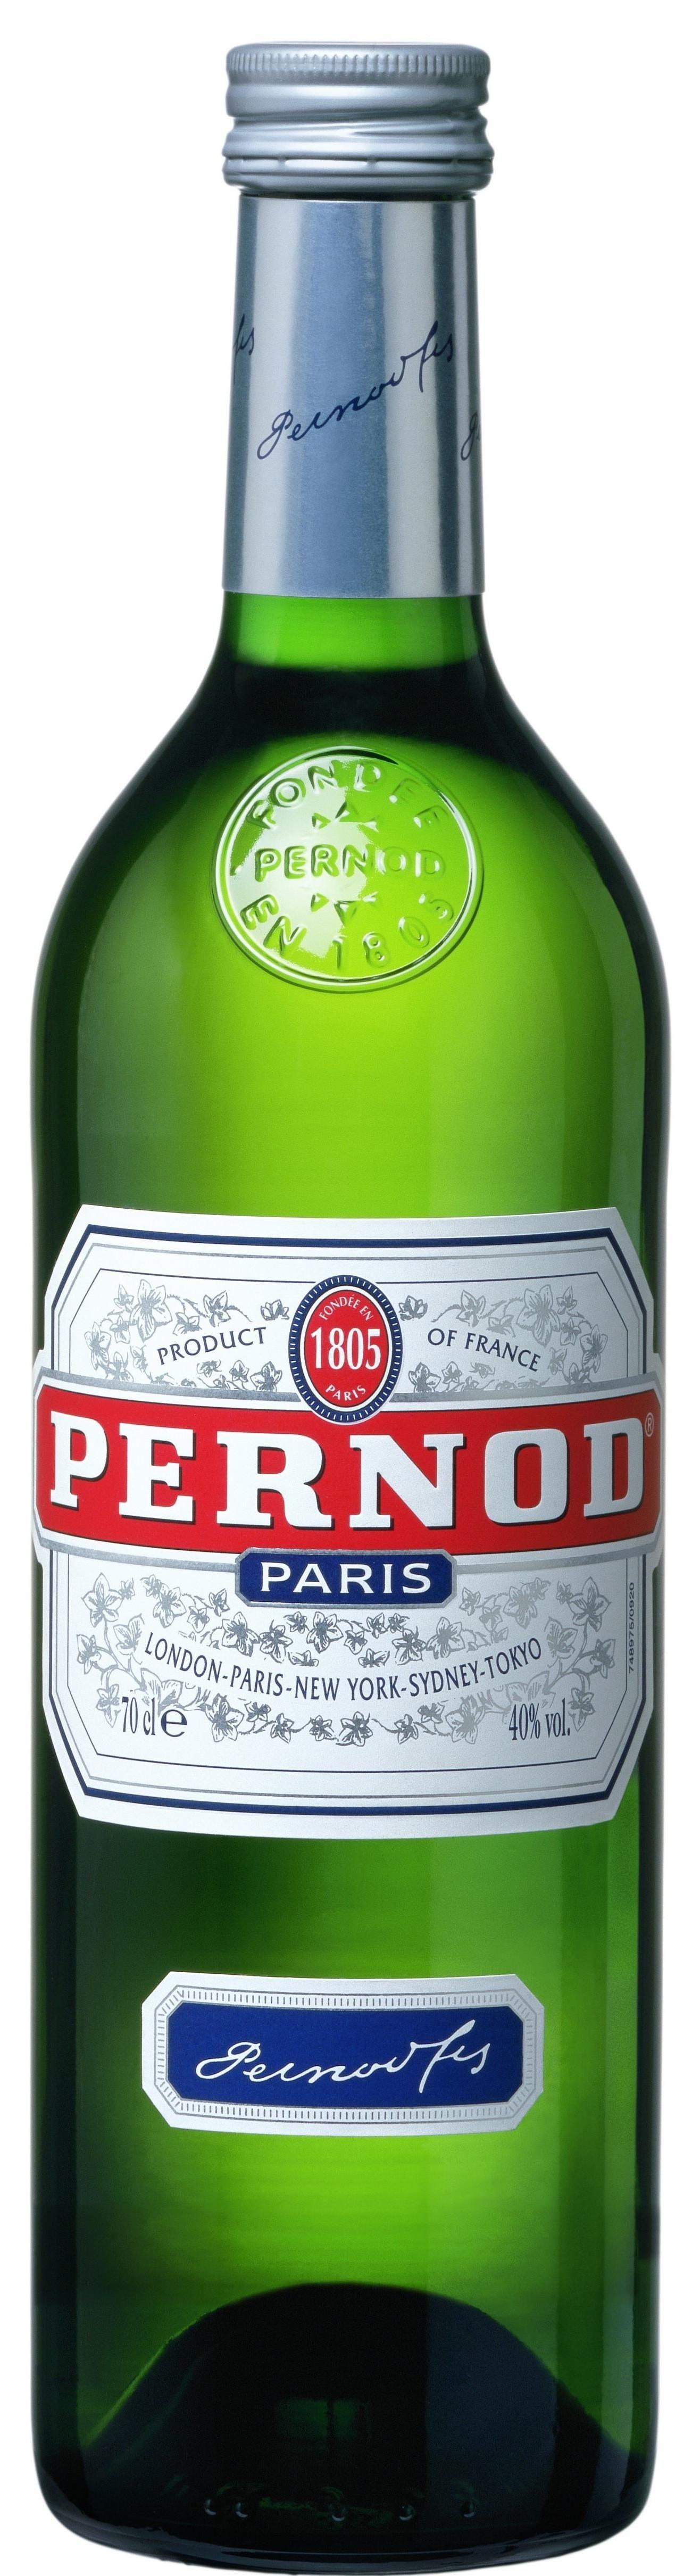 Pernod 40% 0,7l nur 9,99€, Tanqueray Rangpur/Sevilla 15,99€ Real